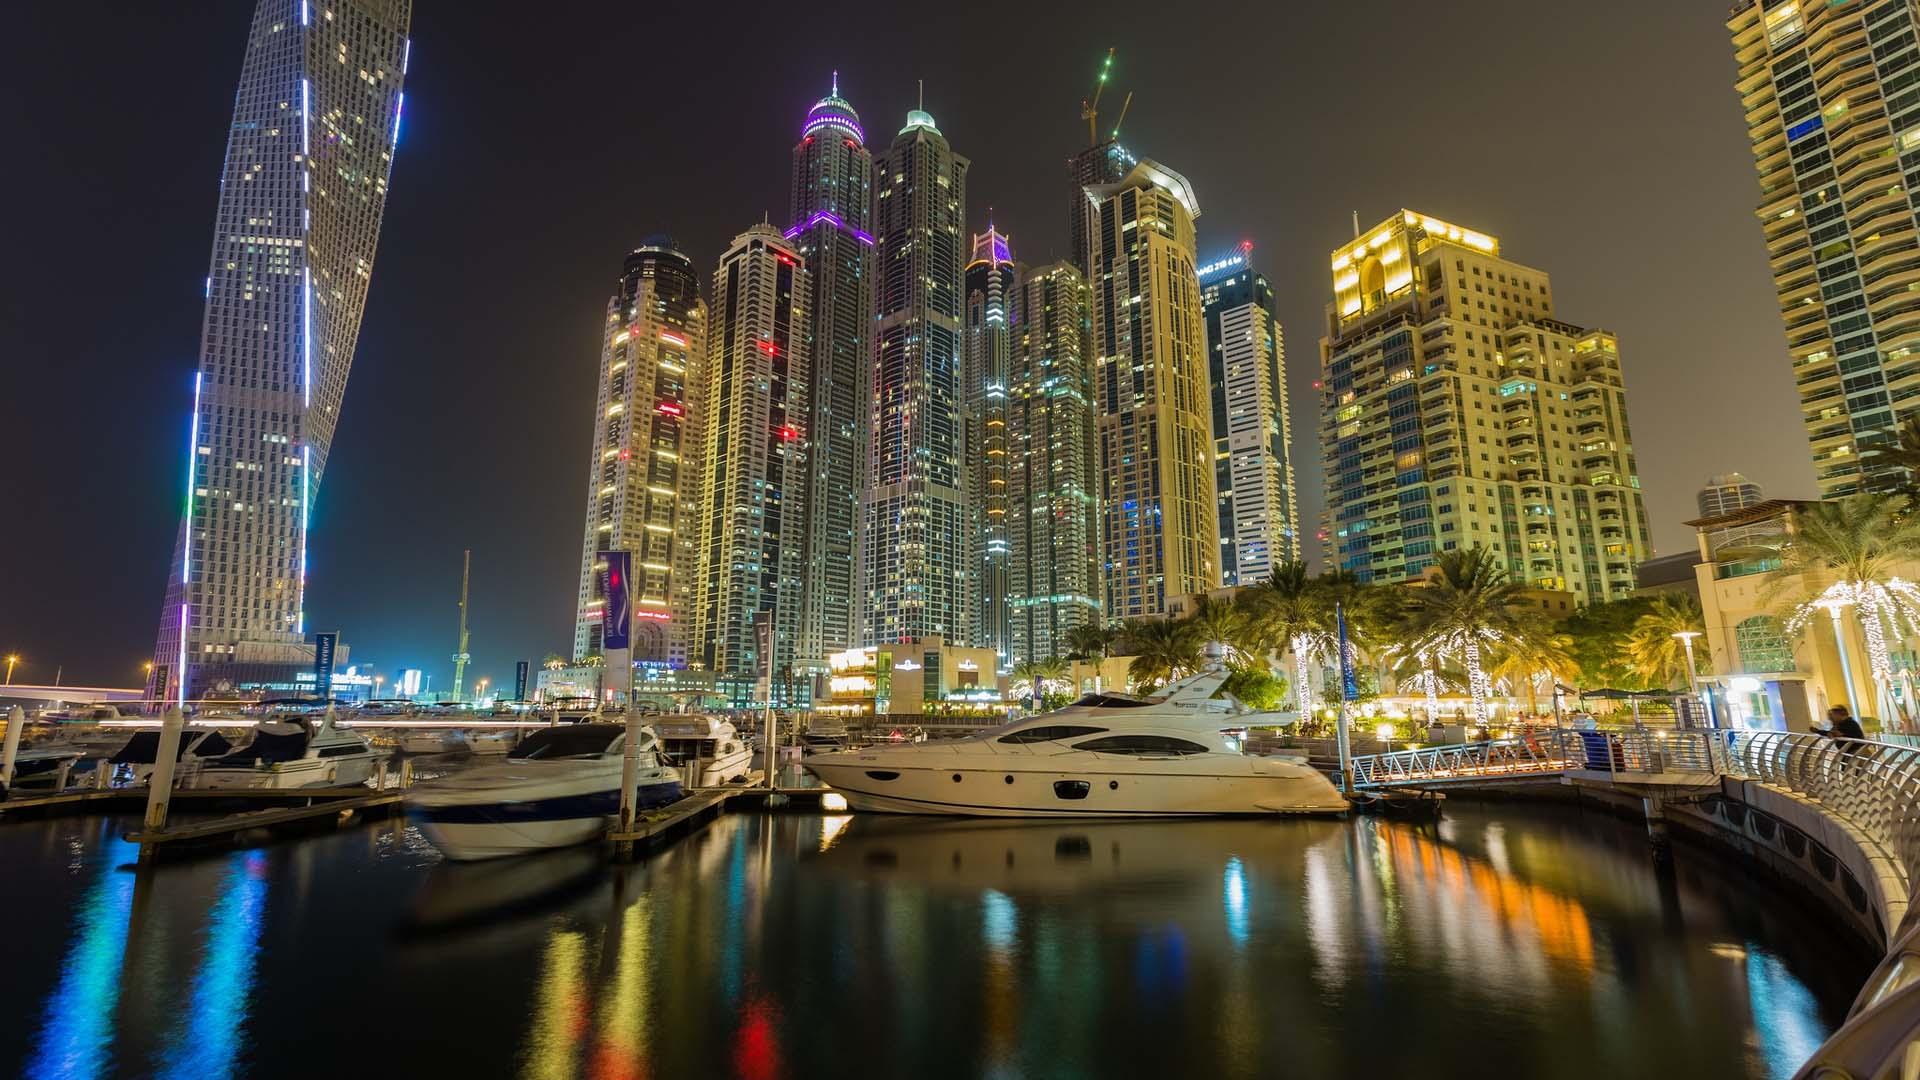 Dubai Marina - 7